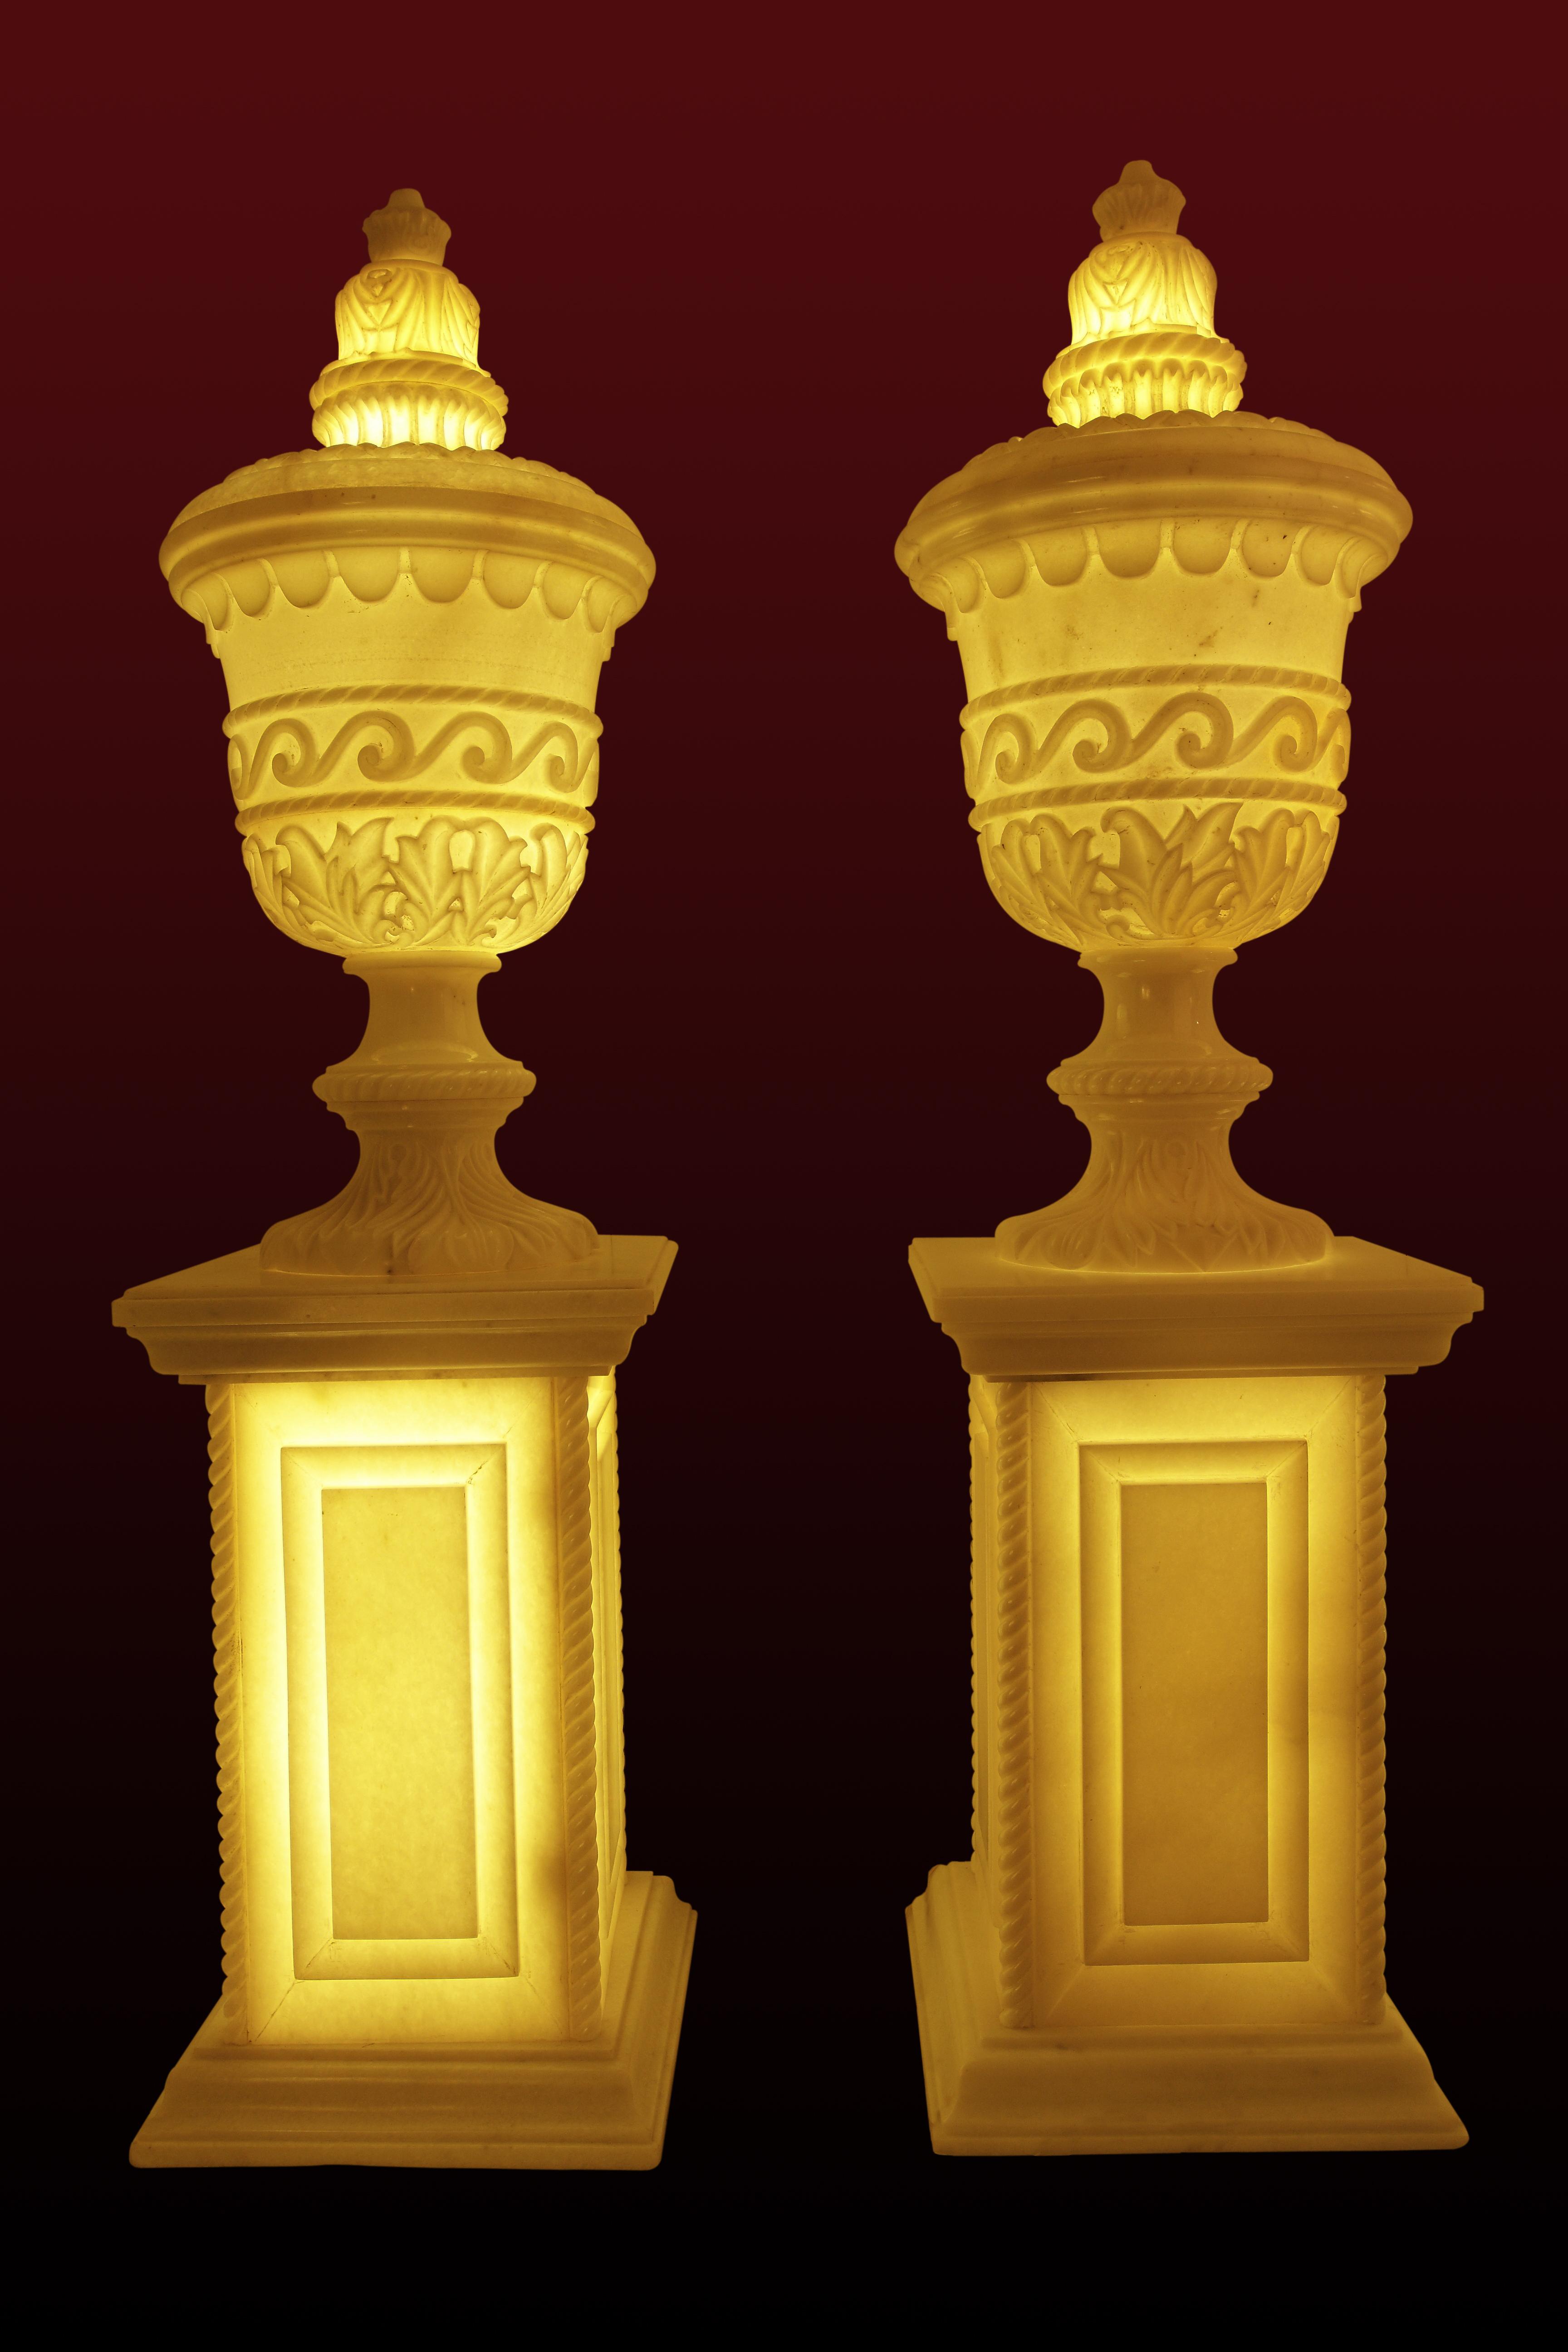 Urn with ornate lid Classic greek geometry